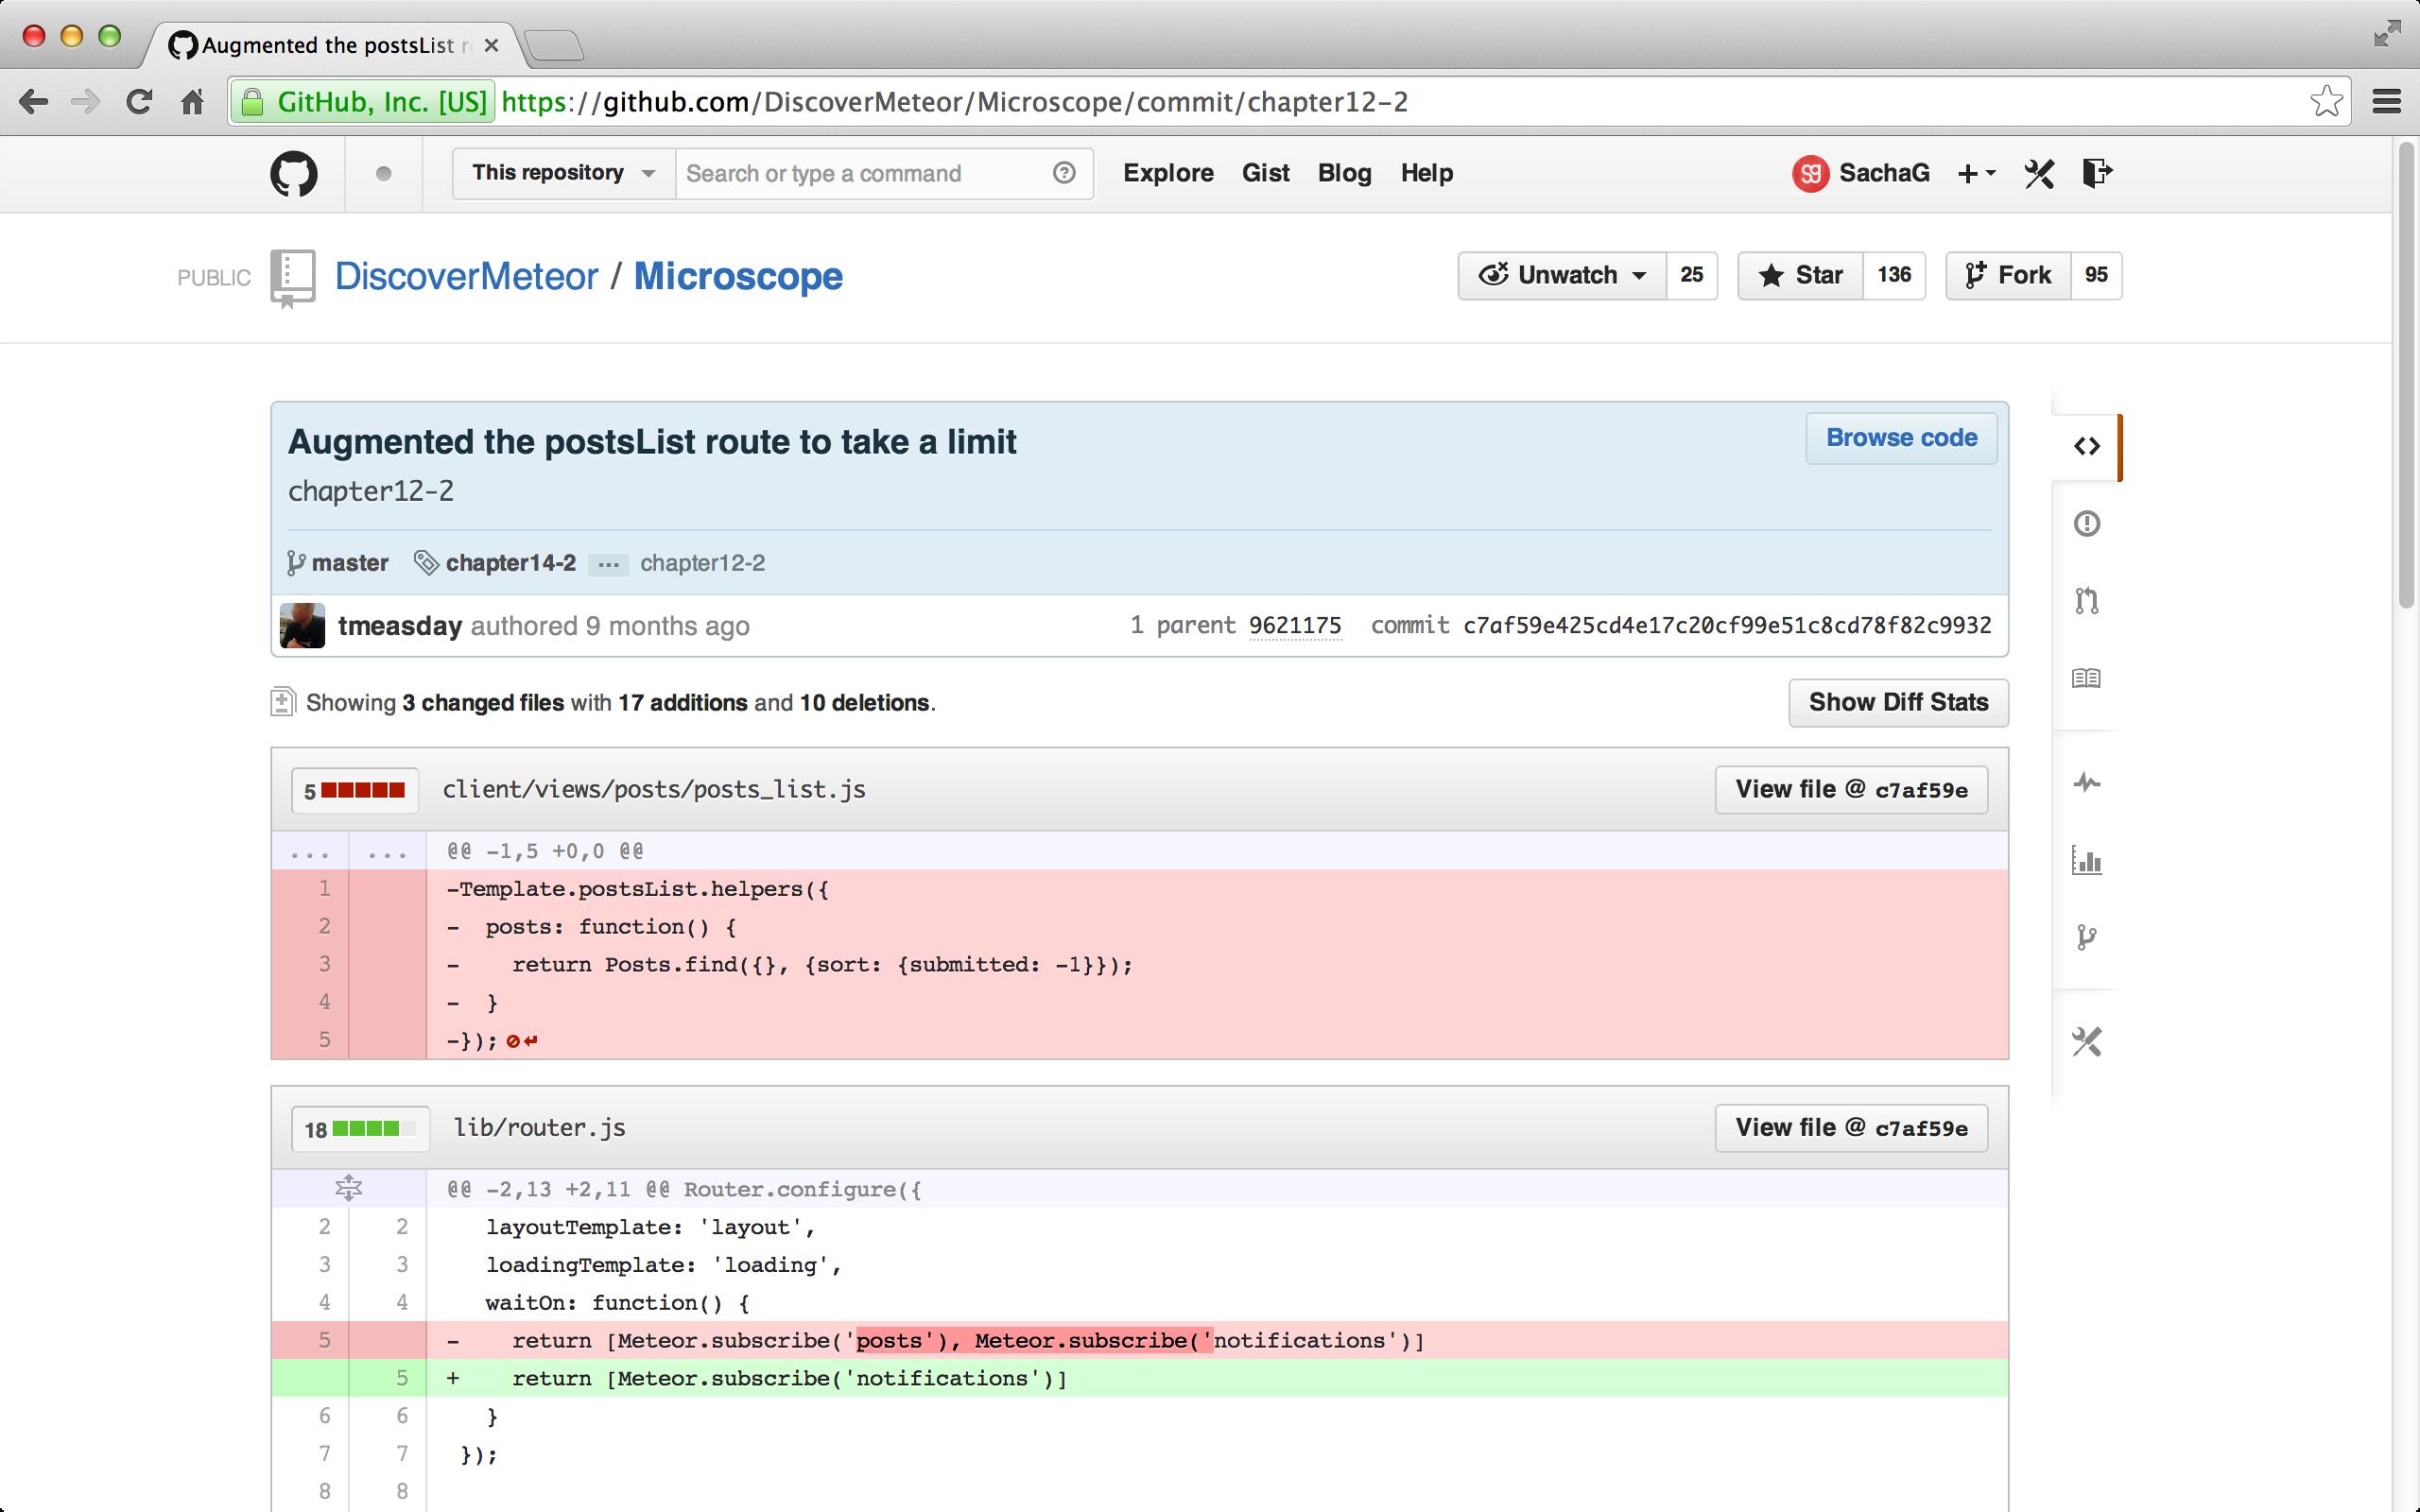 Deleting code.